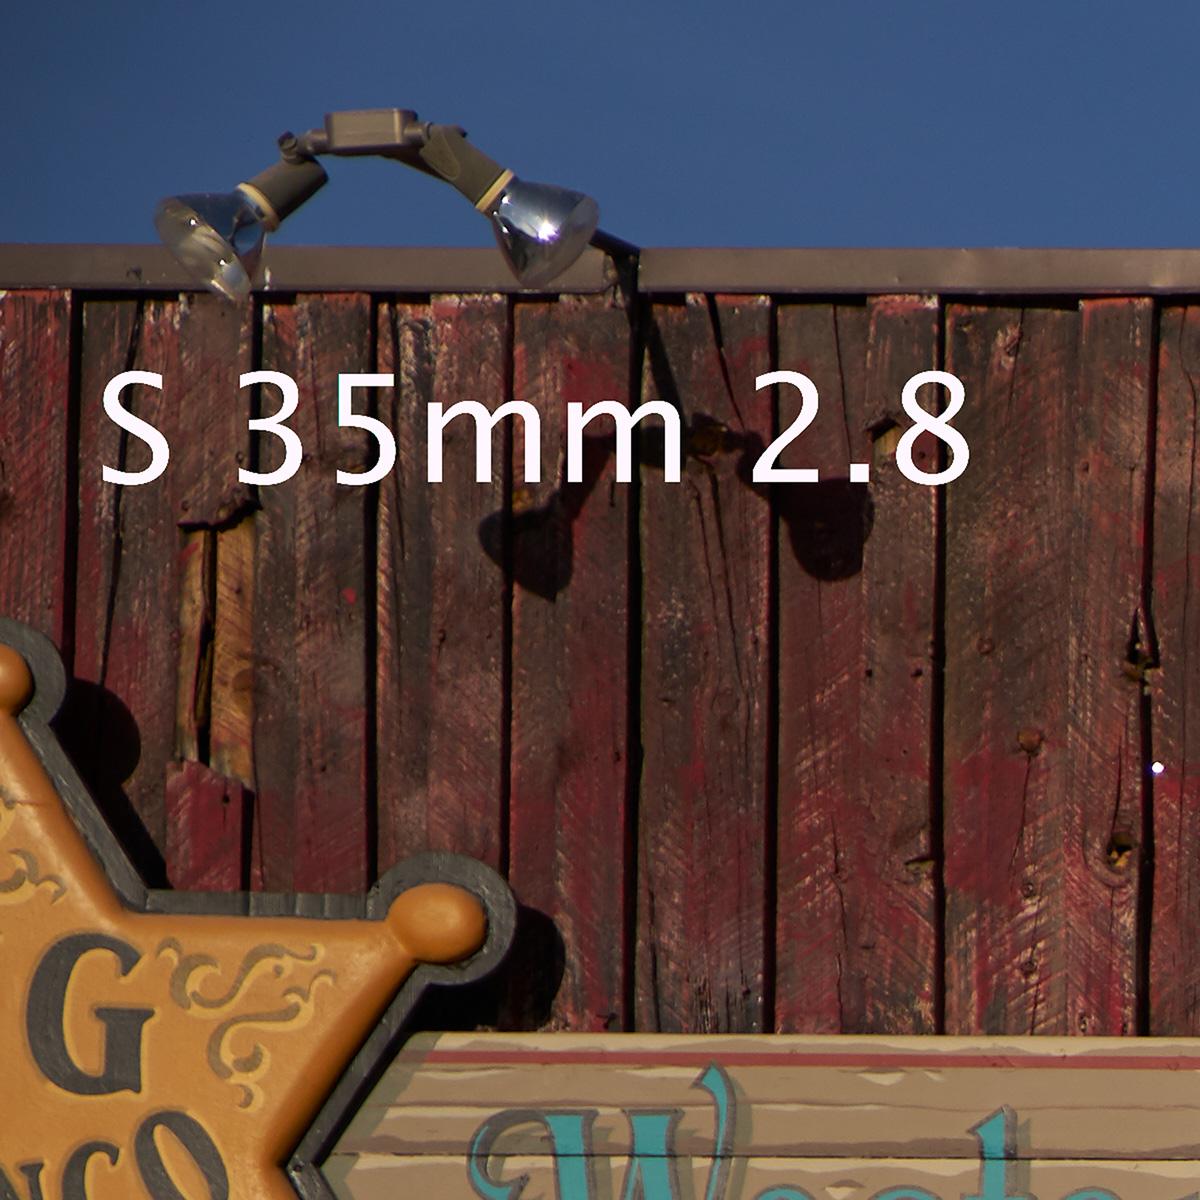 35mm f28 by Guy Mancuso in Guy Mancuso